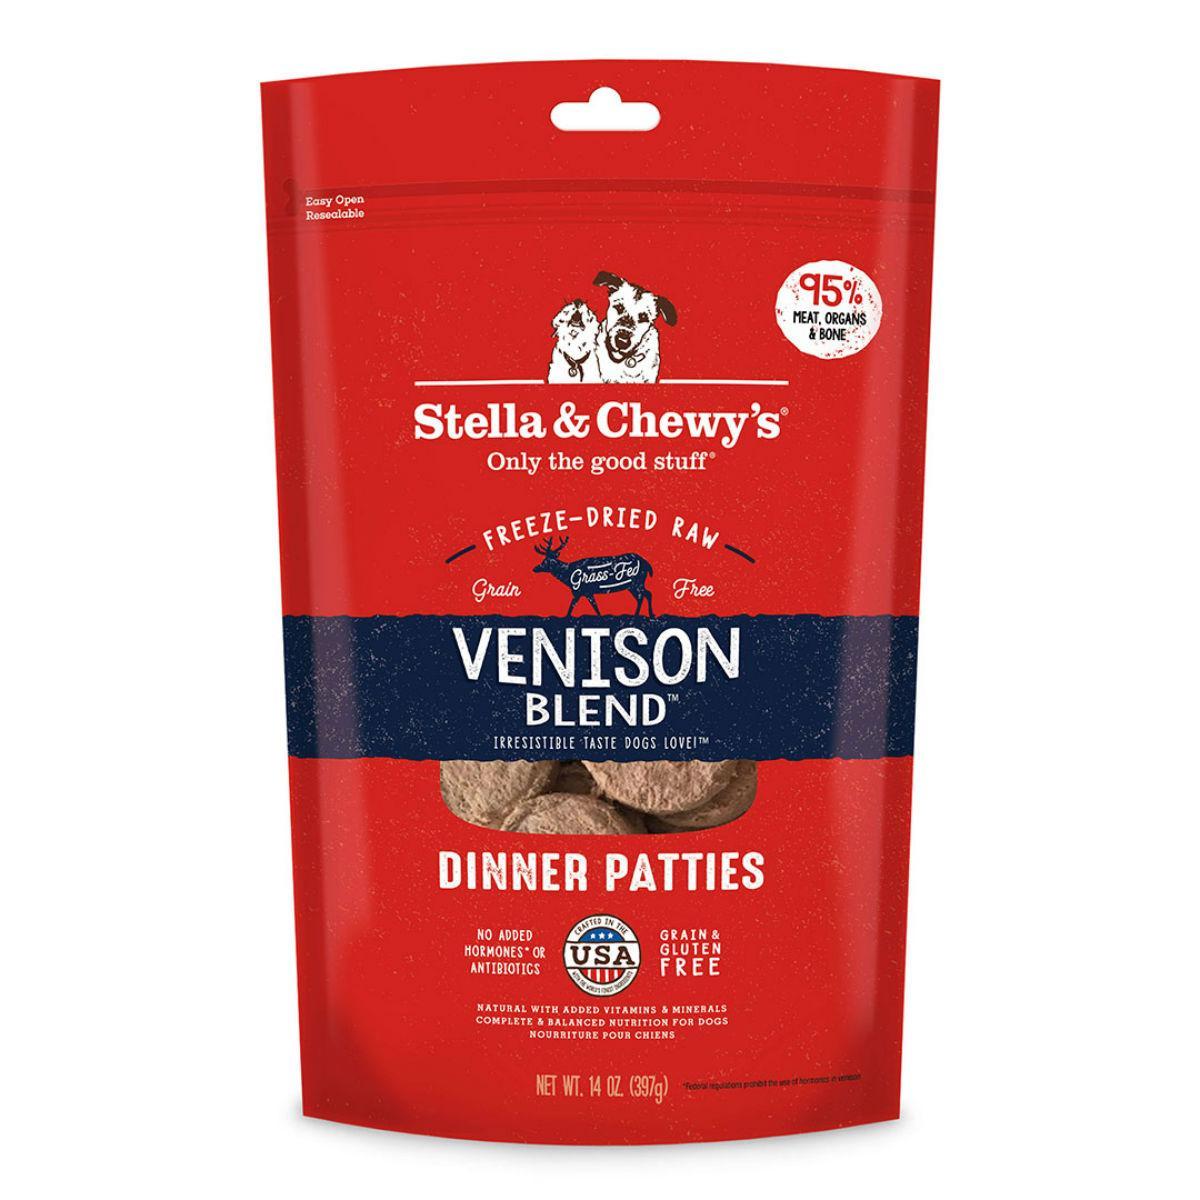 Stella & Chewy's Venison Blend Dinner Patties Dog Treat - Freeze Dried